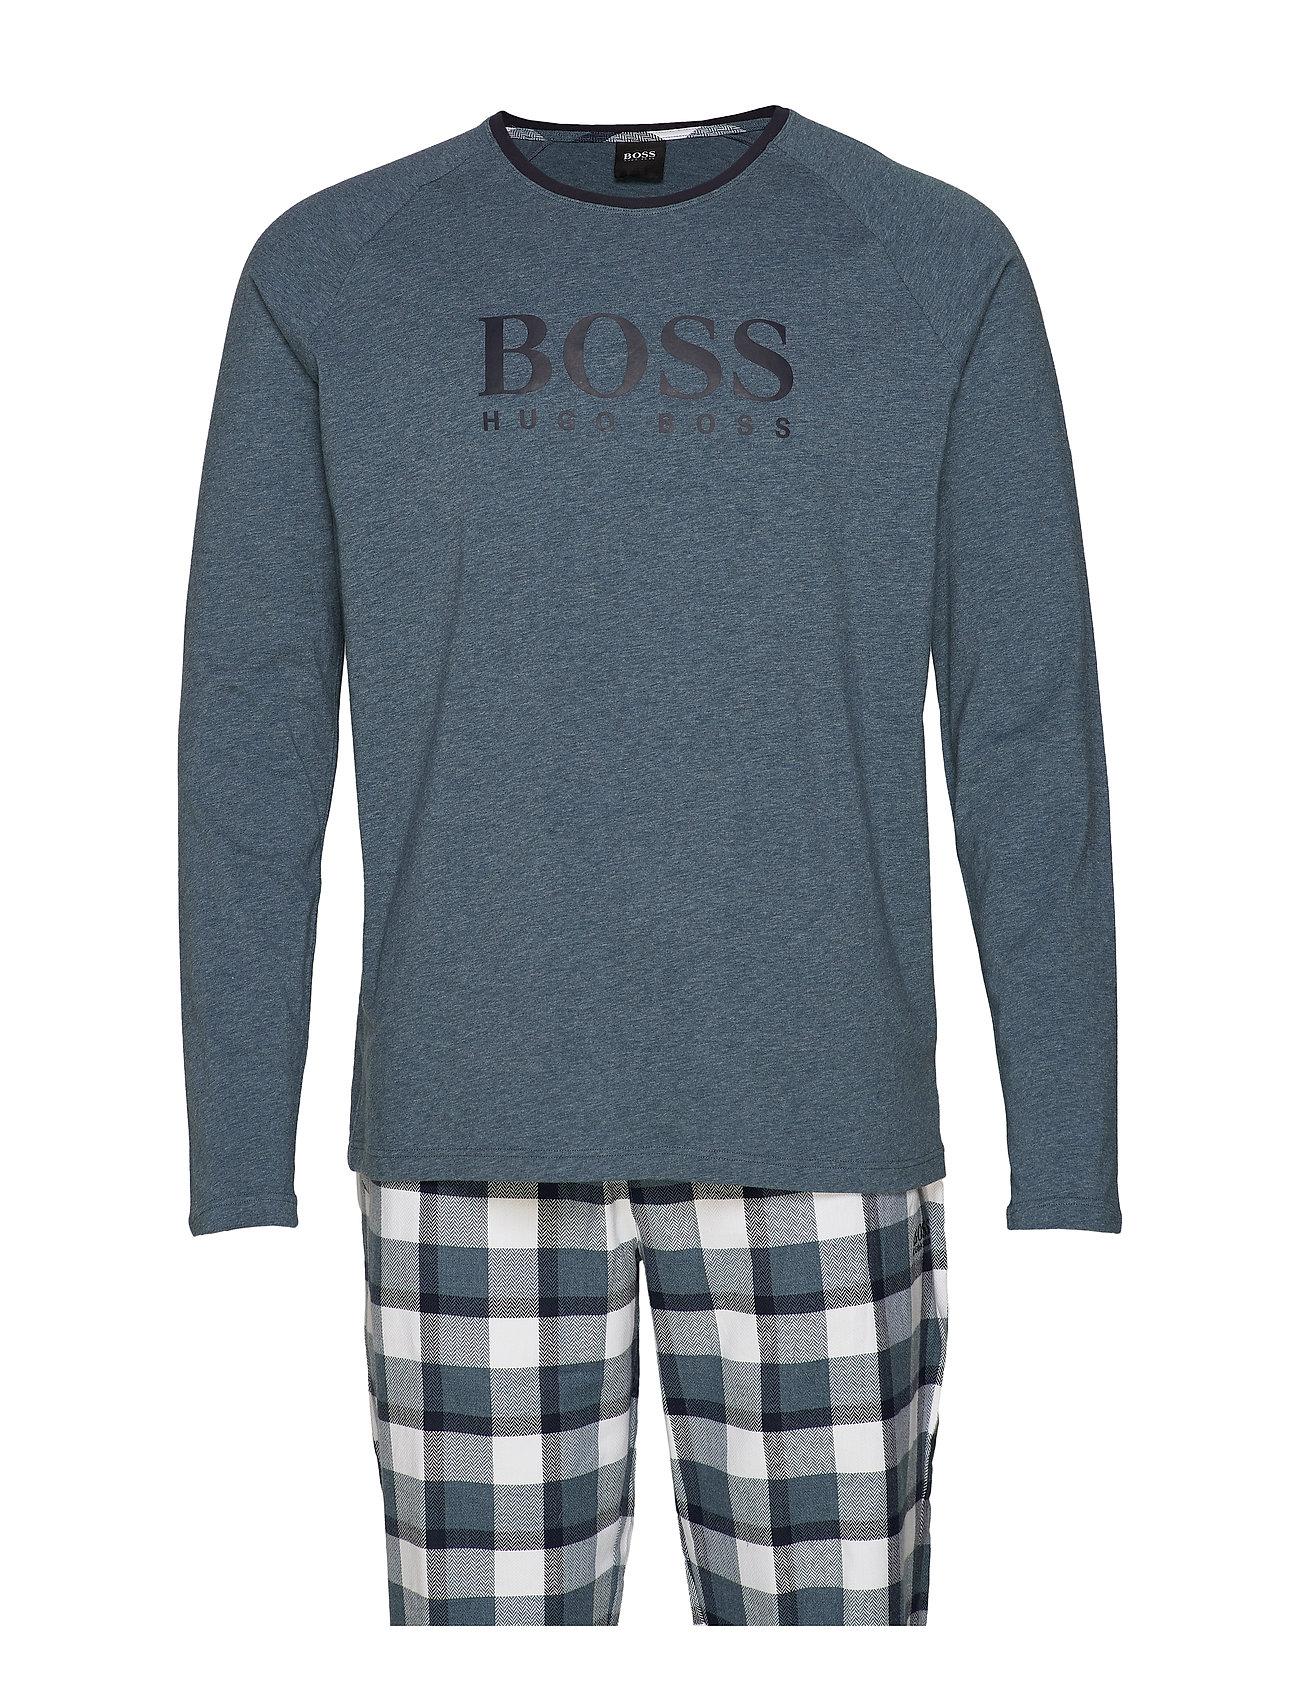 BOSS Business Wear Cosy Long Set - MEDIUM BLUE